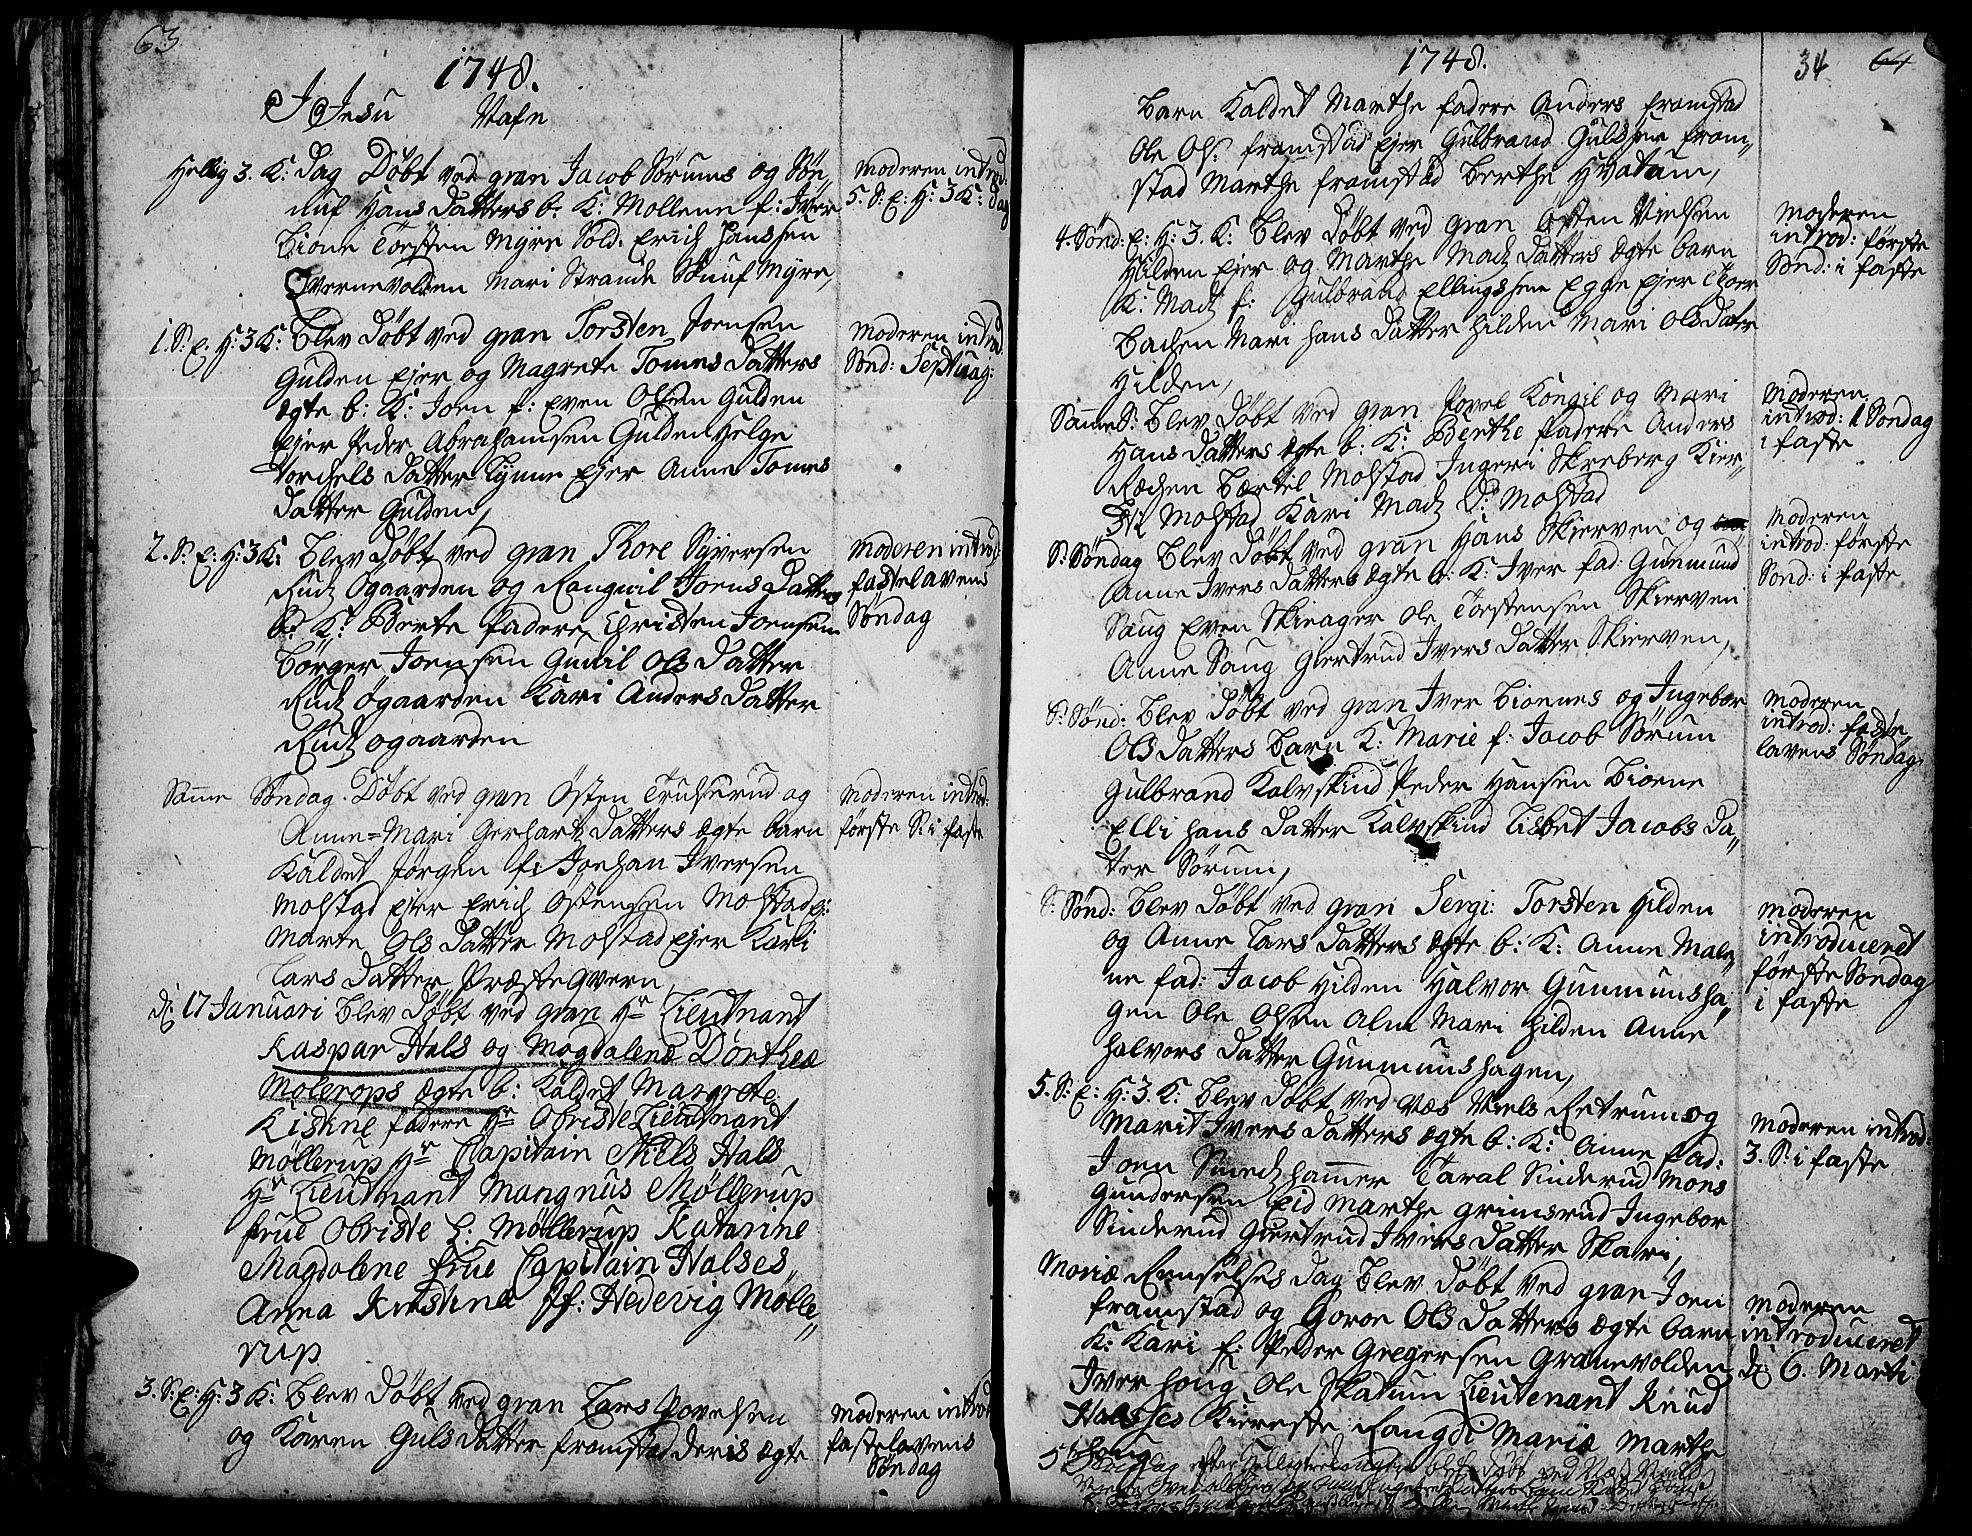 SAH, Gran prestekontor, Ministerialbok nr. 3, 1745-1758, s. 34